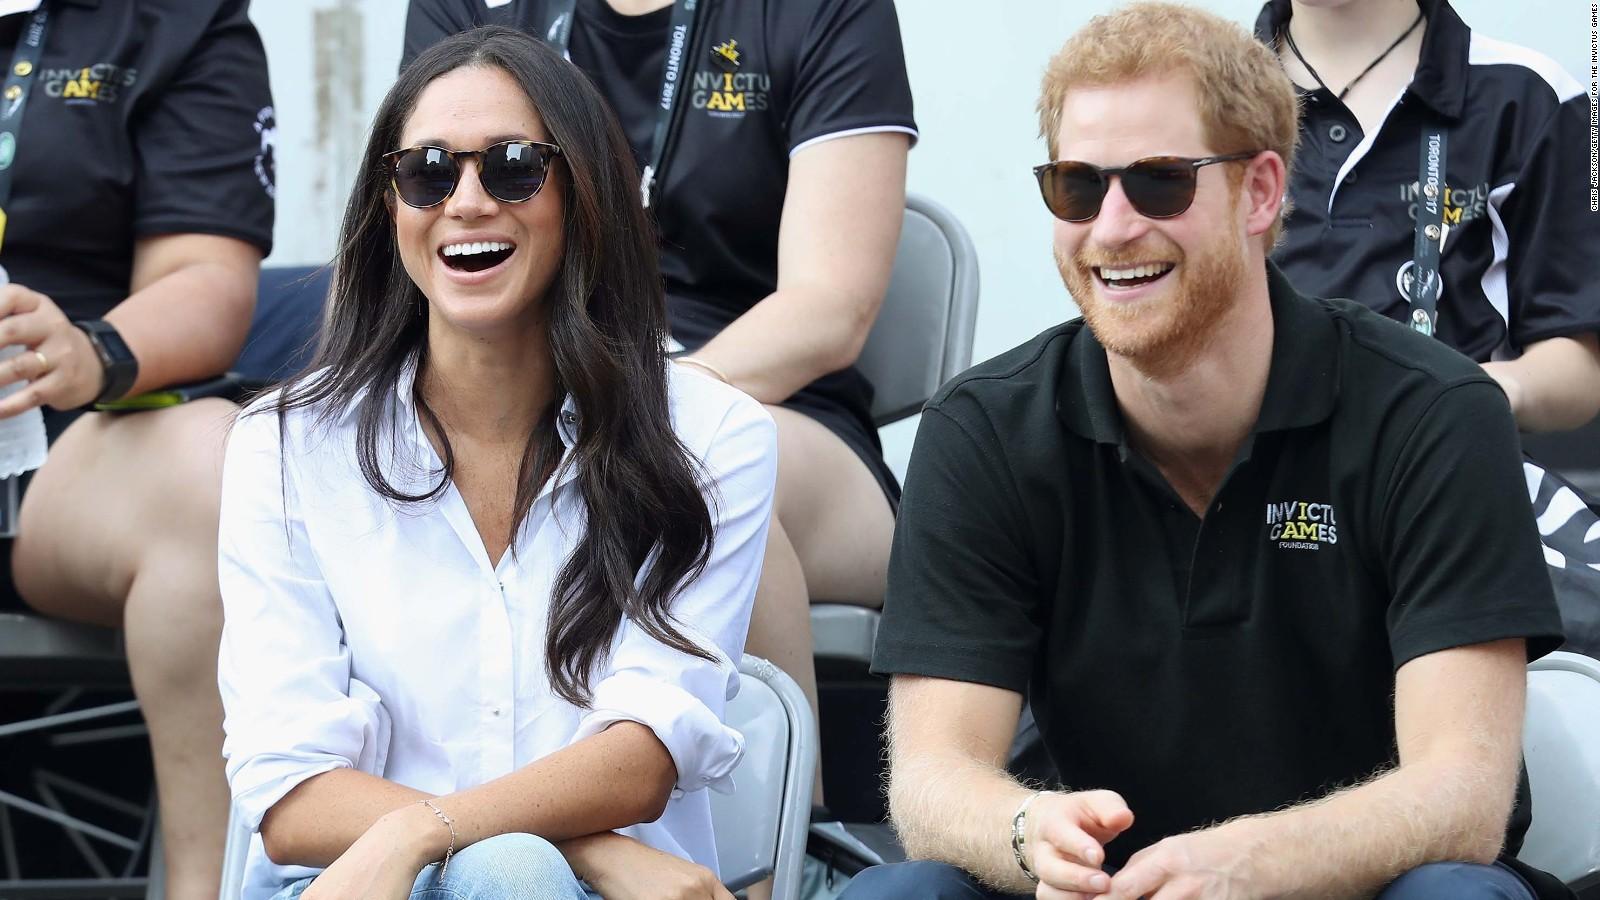 093b08fcca Prince Harry's bride-to-be - the lowdown on Meghan Markle - CNN